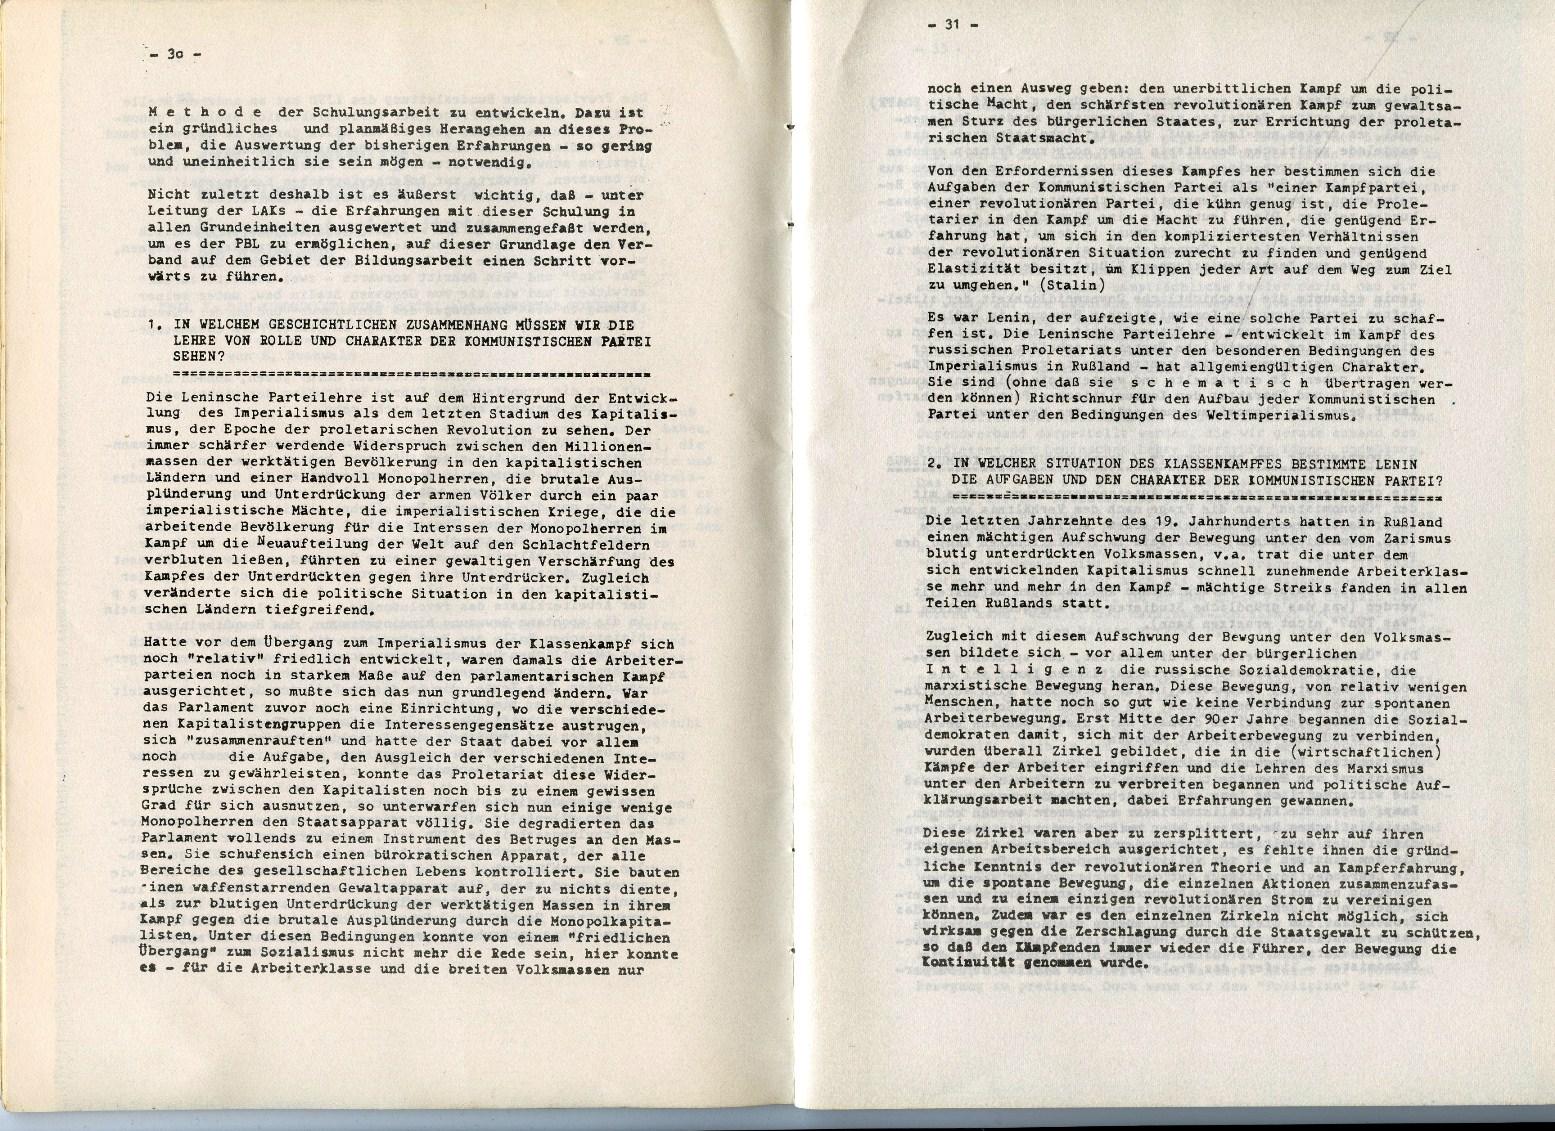 ZB_Universitas_1972_19